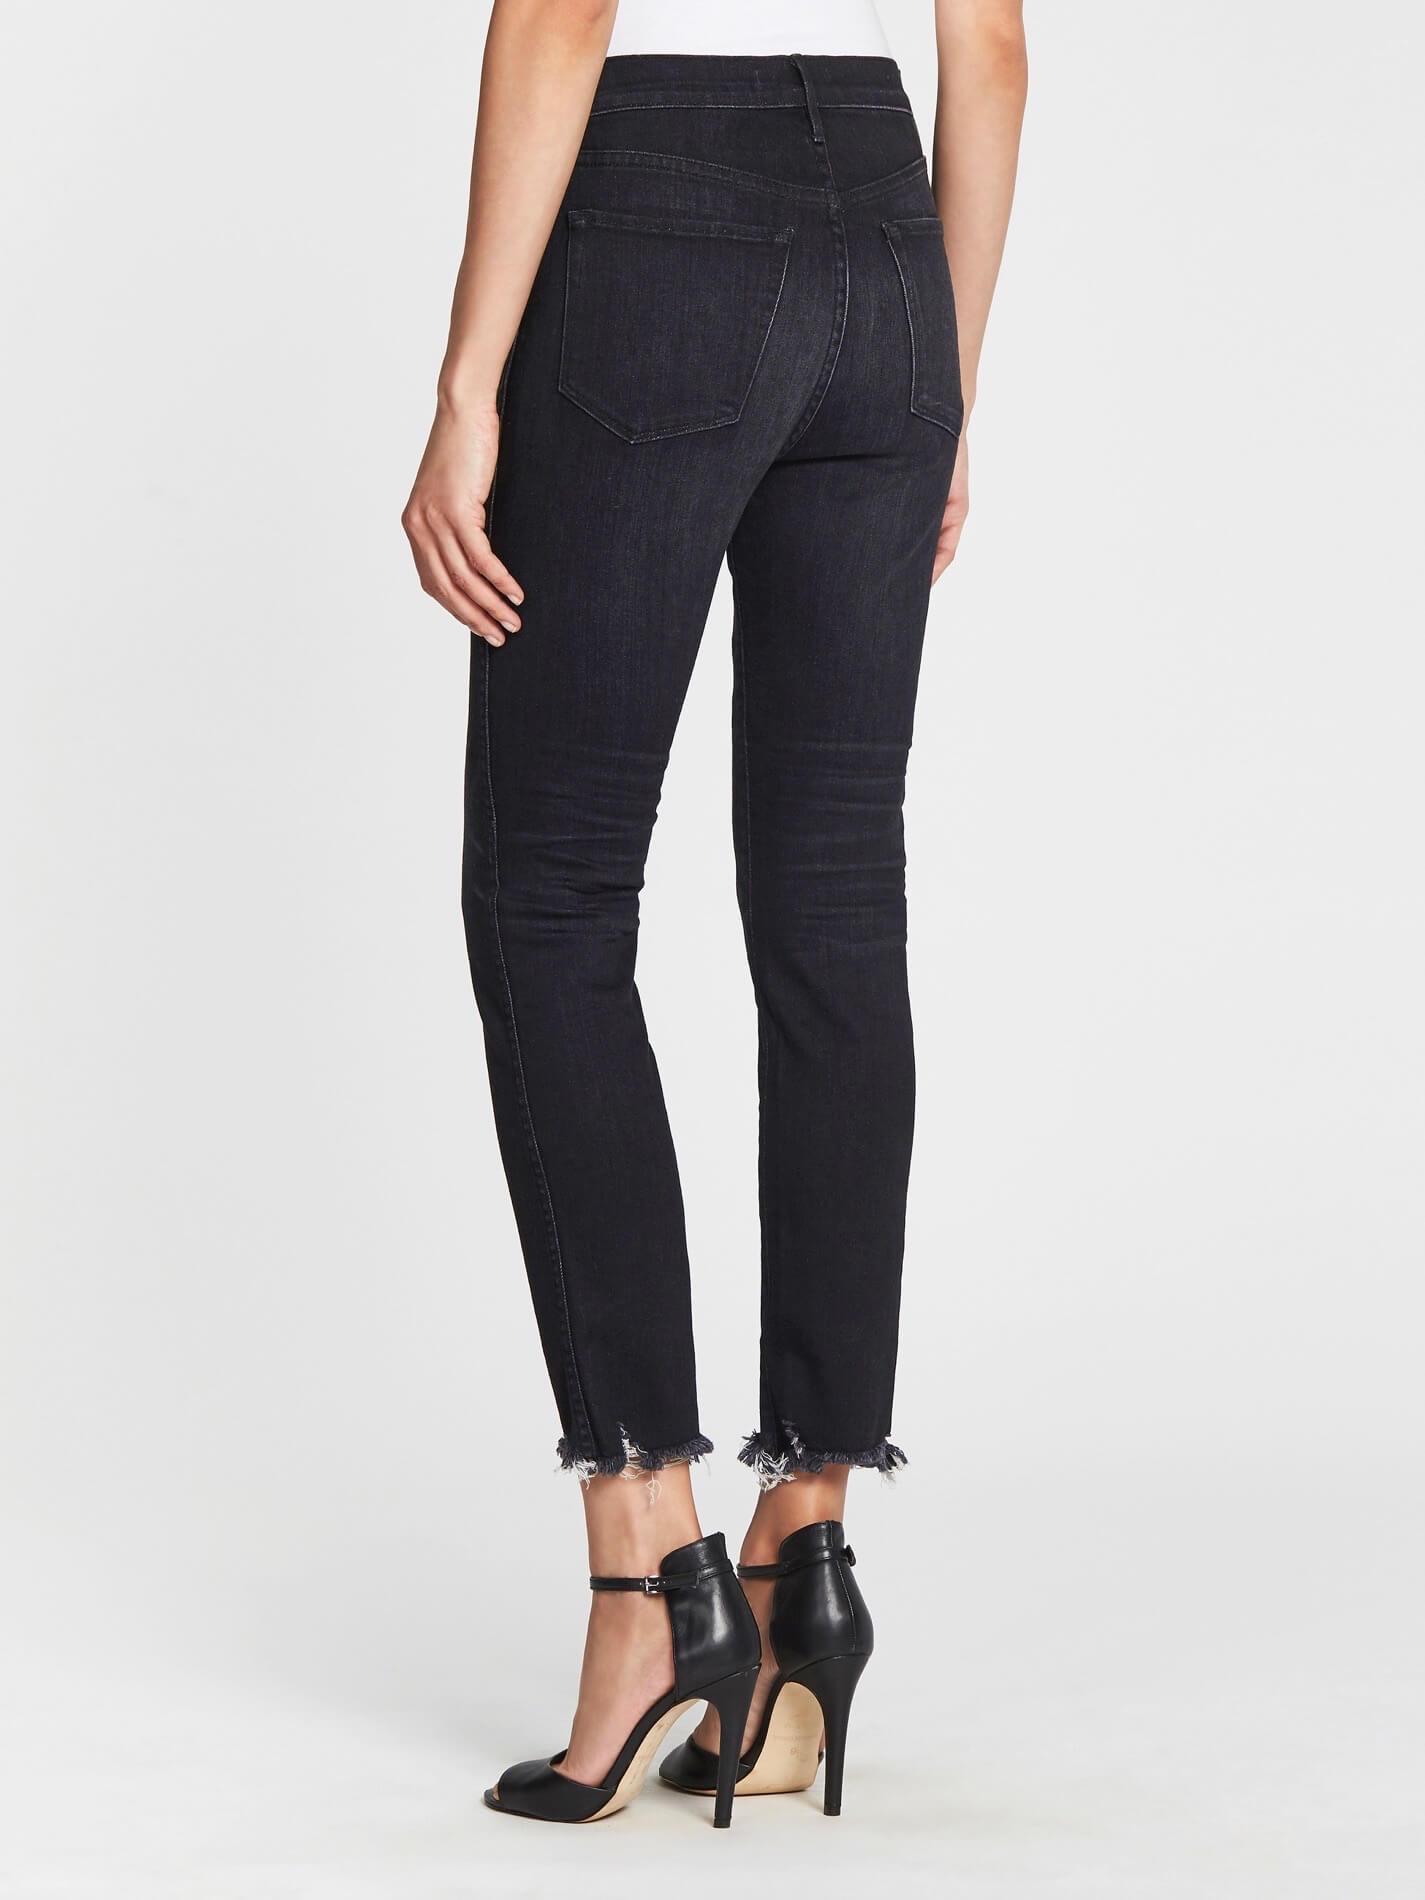 3x1 W3 Straight Authentic Crop Jean - Grey | Garmentory